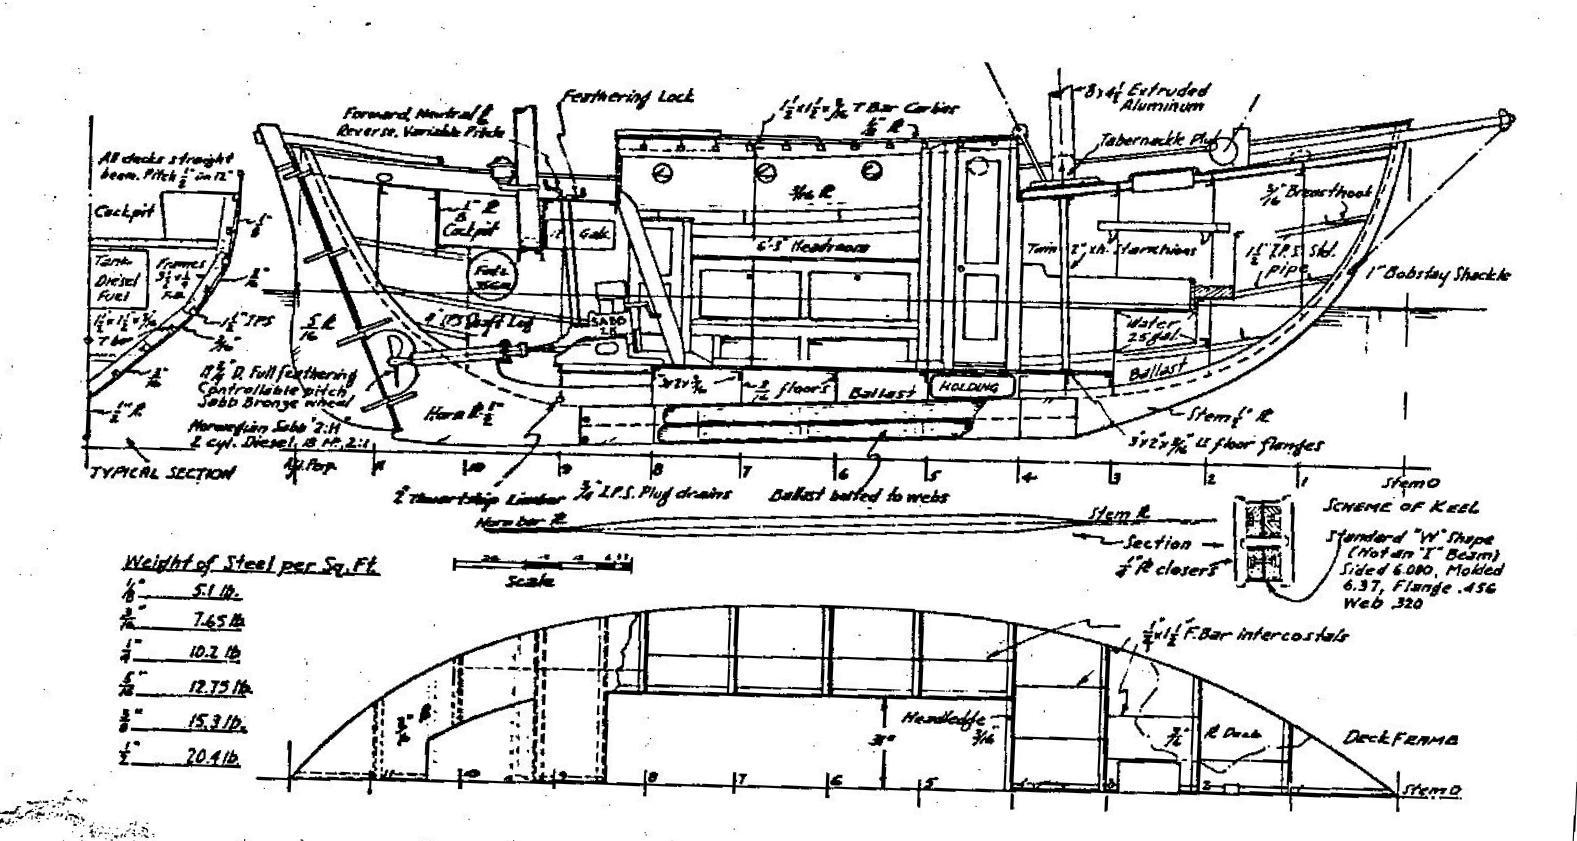 Funky Jet Boat Wiring Diagram Ideas - Wiring Diagram Ideas ...